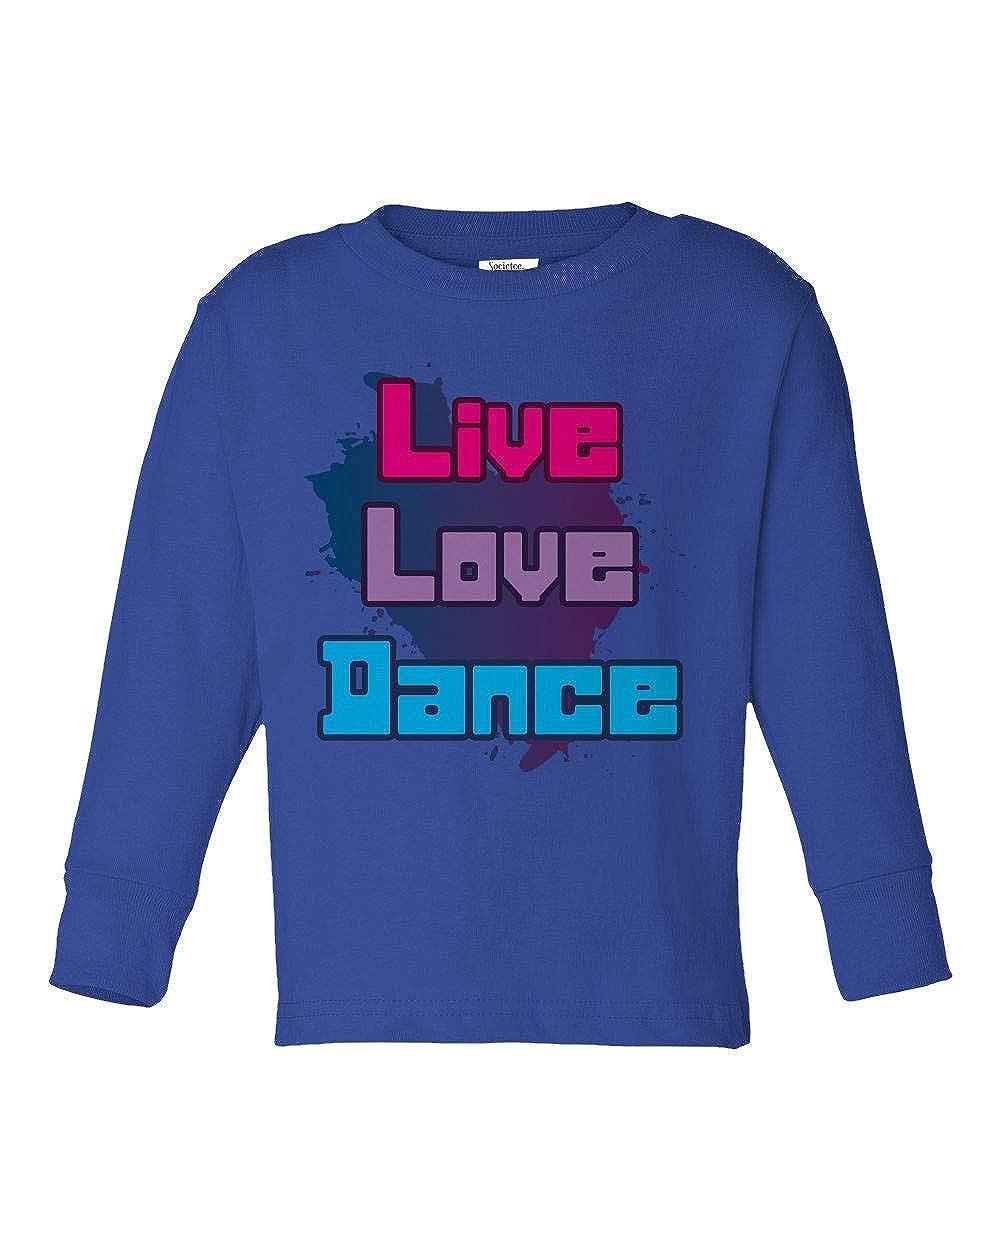 Societee Live Love Dance Cute Girls Boys Toddler Long Sleeve T-Shirt